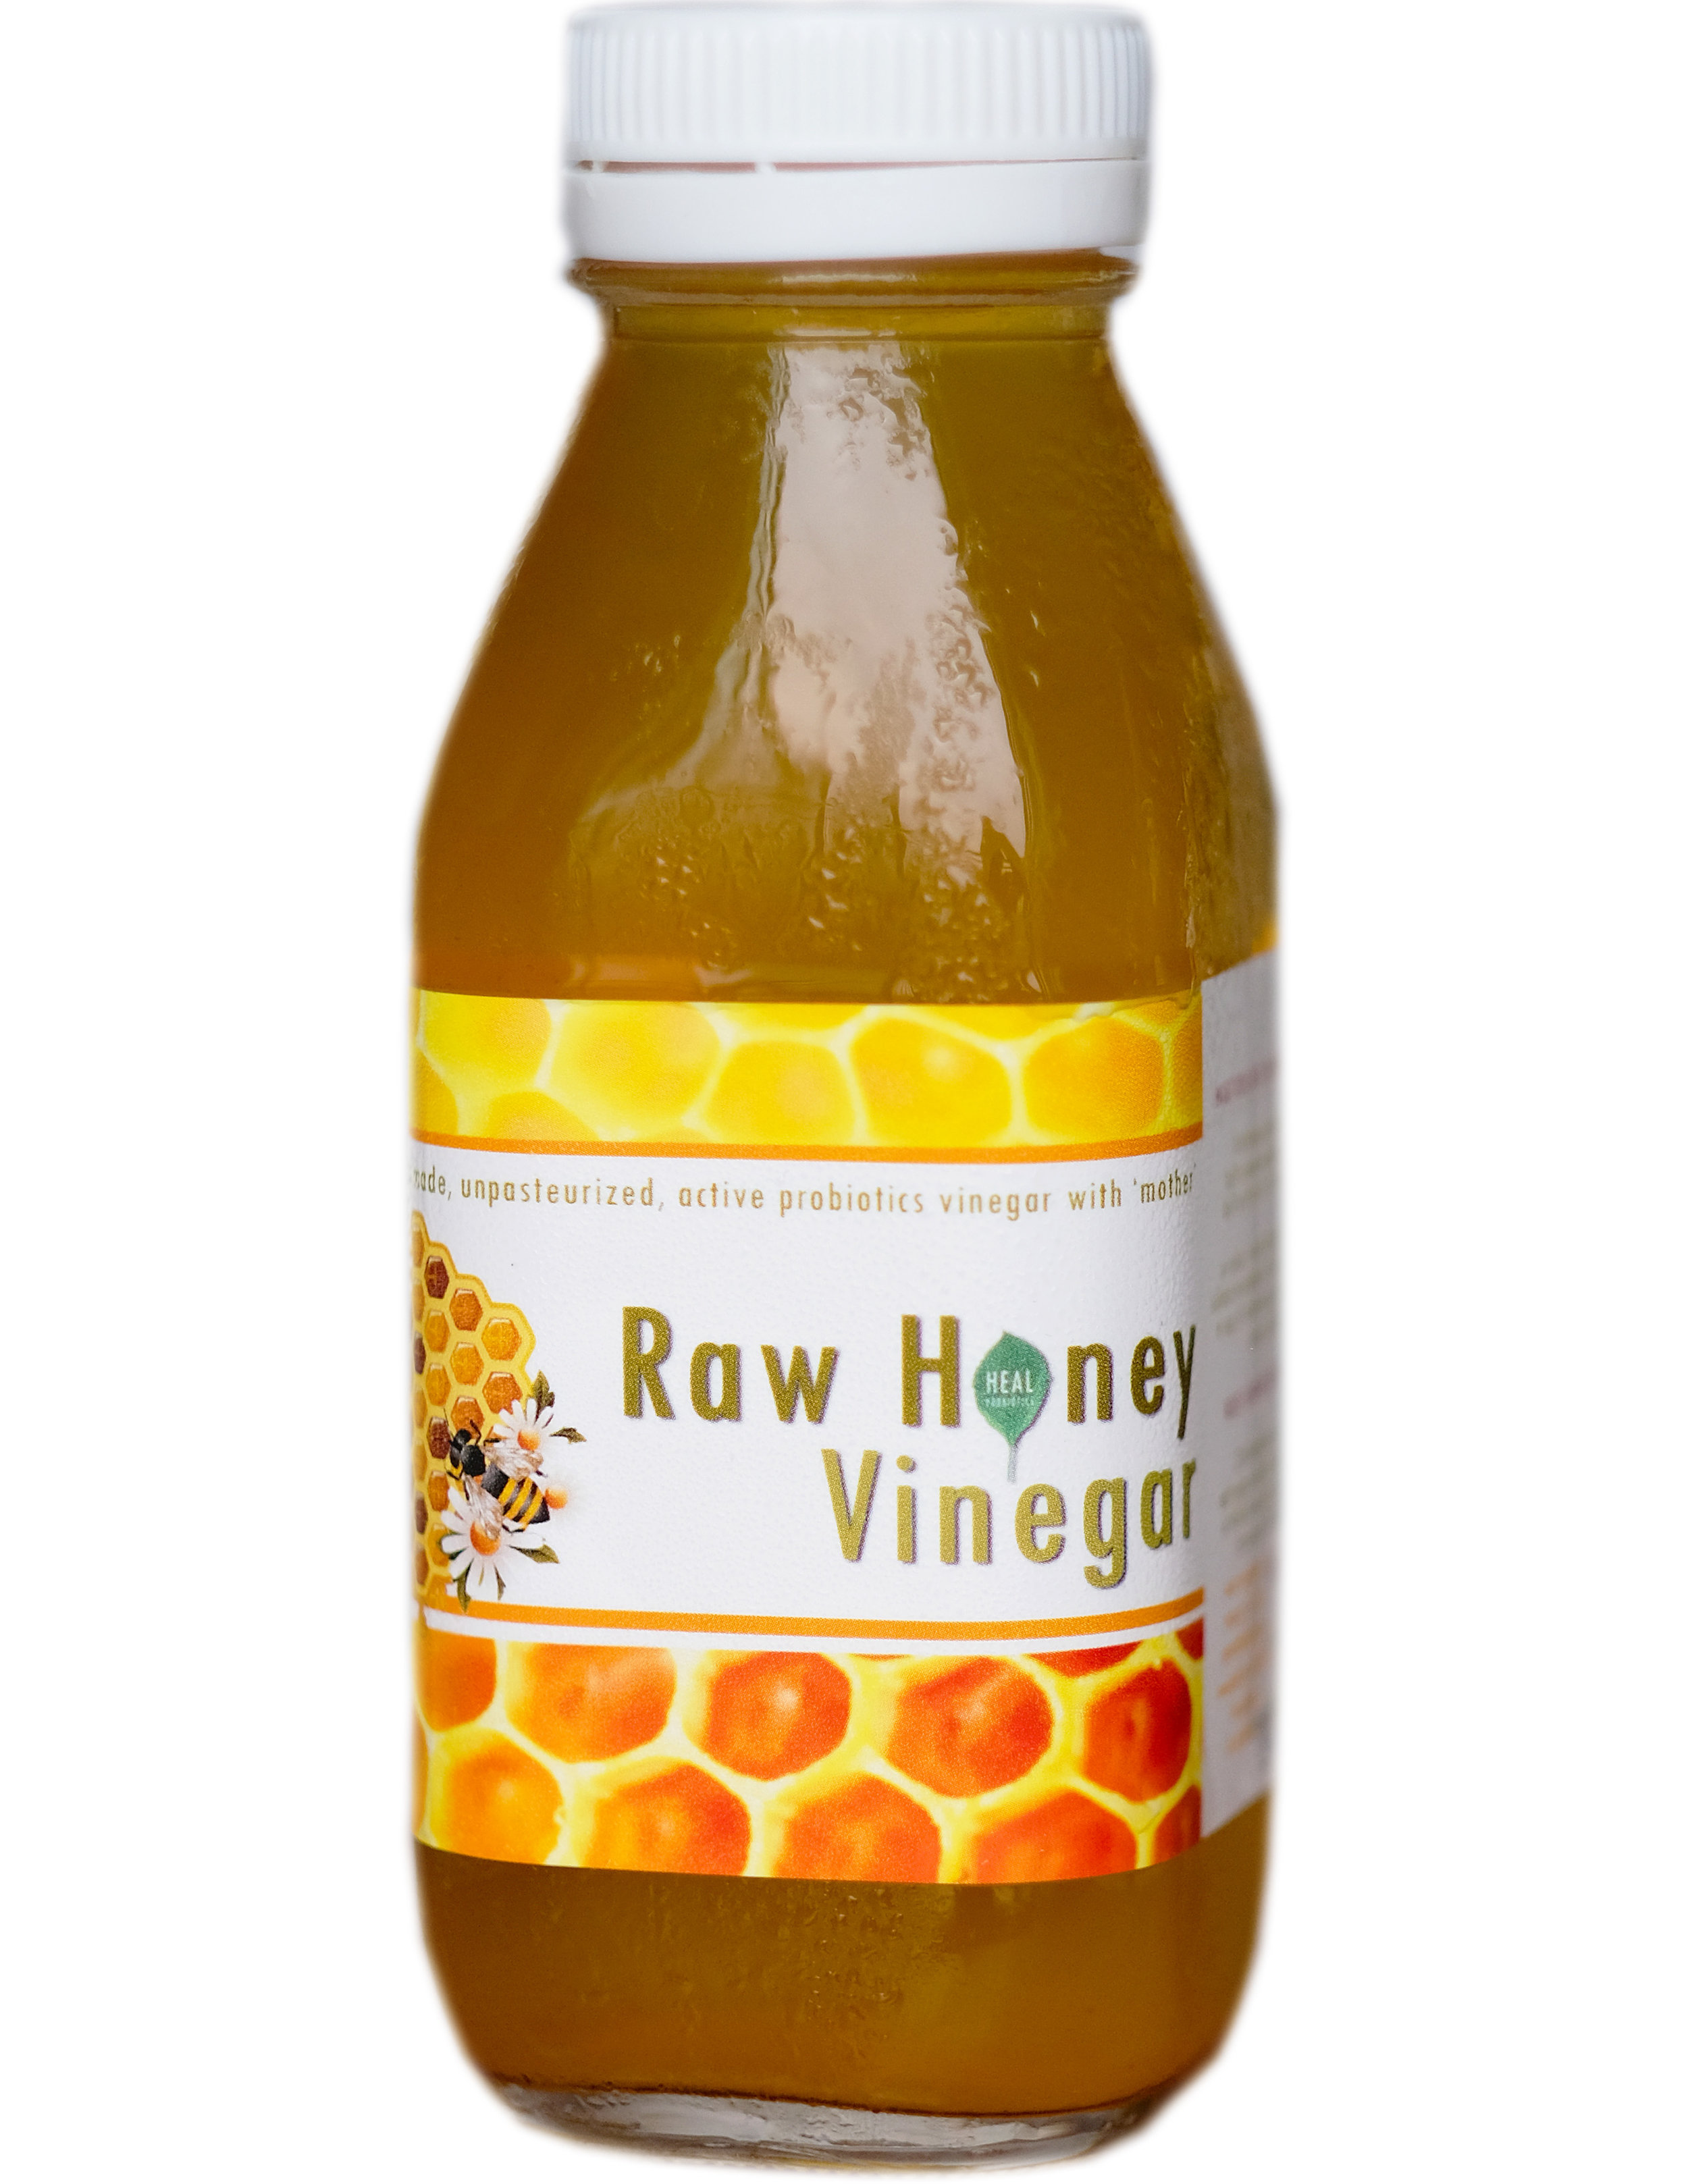 Siapa tidak kenal dengan khasiat cuka probiotik untuk kesehatan? Sayangnya, cuka apel berkualitas tinggi mahal untuk didapat, karena harganya tinggi dan juga proses importasi meninggalkan jejak karbon yang sangat tinggi.  Cuka madu kami dibuat dari bahan-bahan lokal bermutu tertinggi. Cuka ini juga mengandung bee polen dan propolis dari madu, dan juga asam glukuronik untuk detoksifikasi liver.  Difermentasi selama berbulan-bulan, cuka madu kami sangat enak dan menyegarkan. Gunakan untuk masakan, salada, minuman  elixir  cuka, dan lainnya.  Komposisi: Air mineral, kultur, madu belum diproses, Teh Jawa oolong  Dikemas dalam botol gelas, 100% recyclable, reusable, and  refundable.  300 ml.  RESEP  klik di sini   KONTAK KAMI  klik di sini